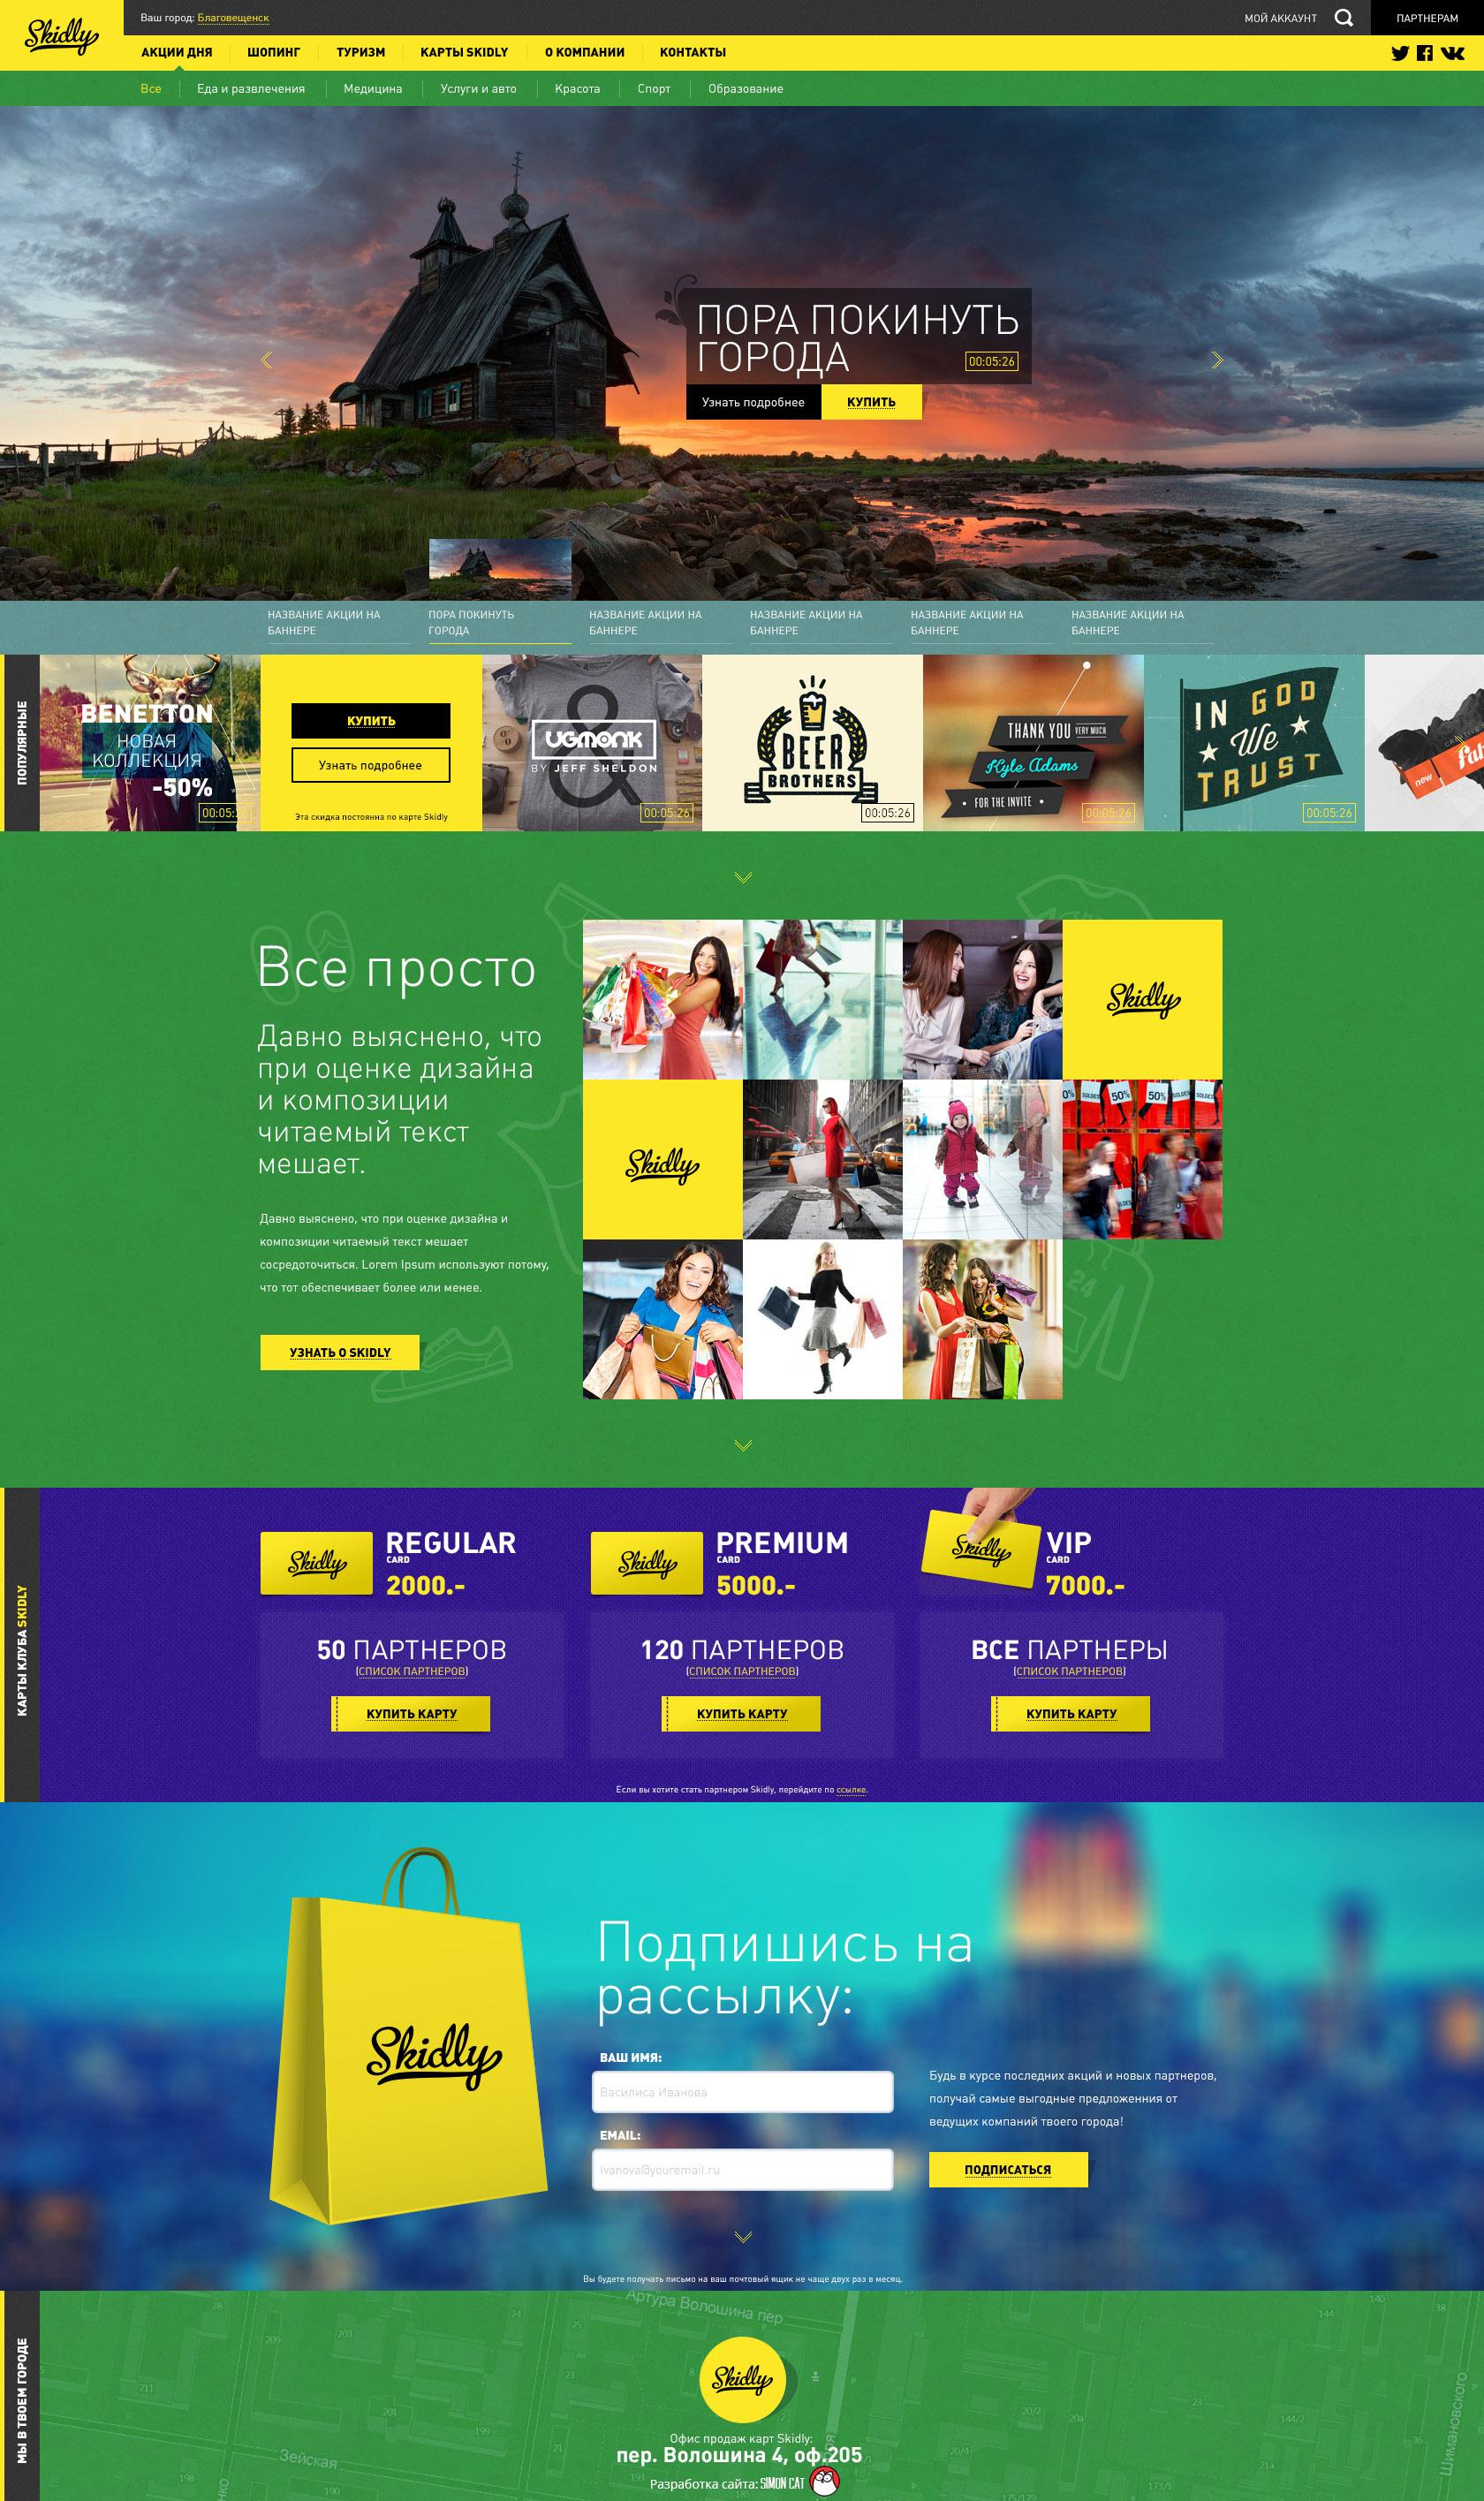 Дизайн сайта Shidly